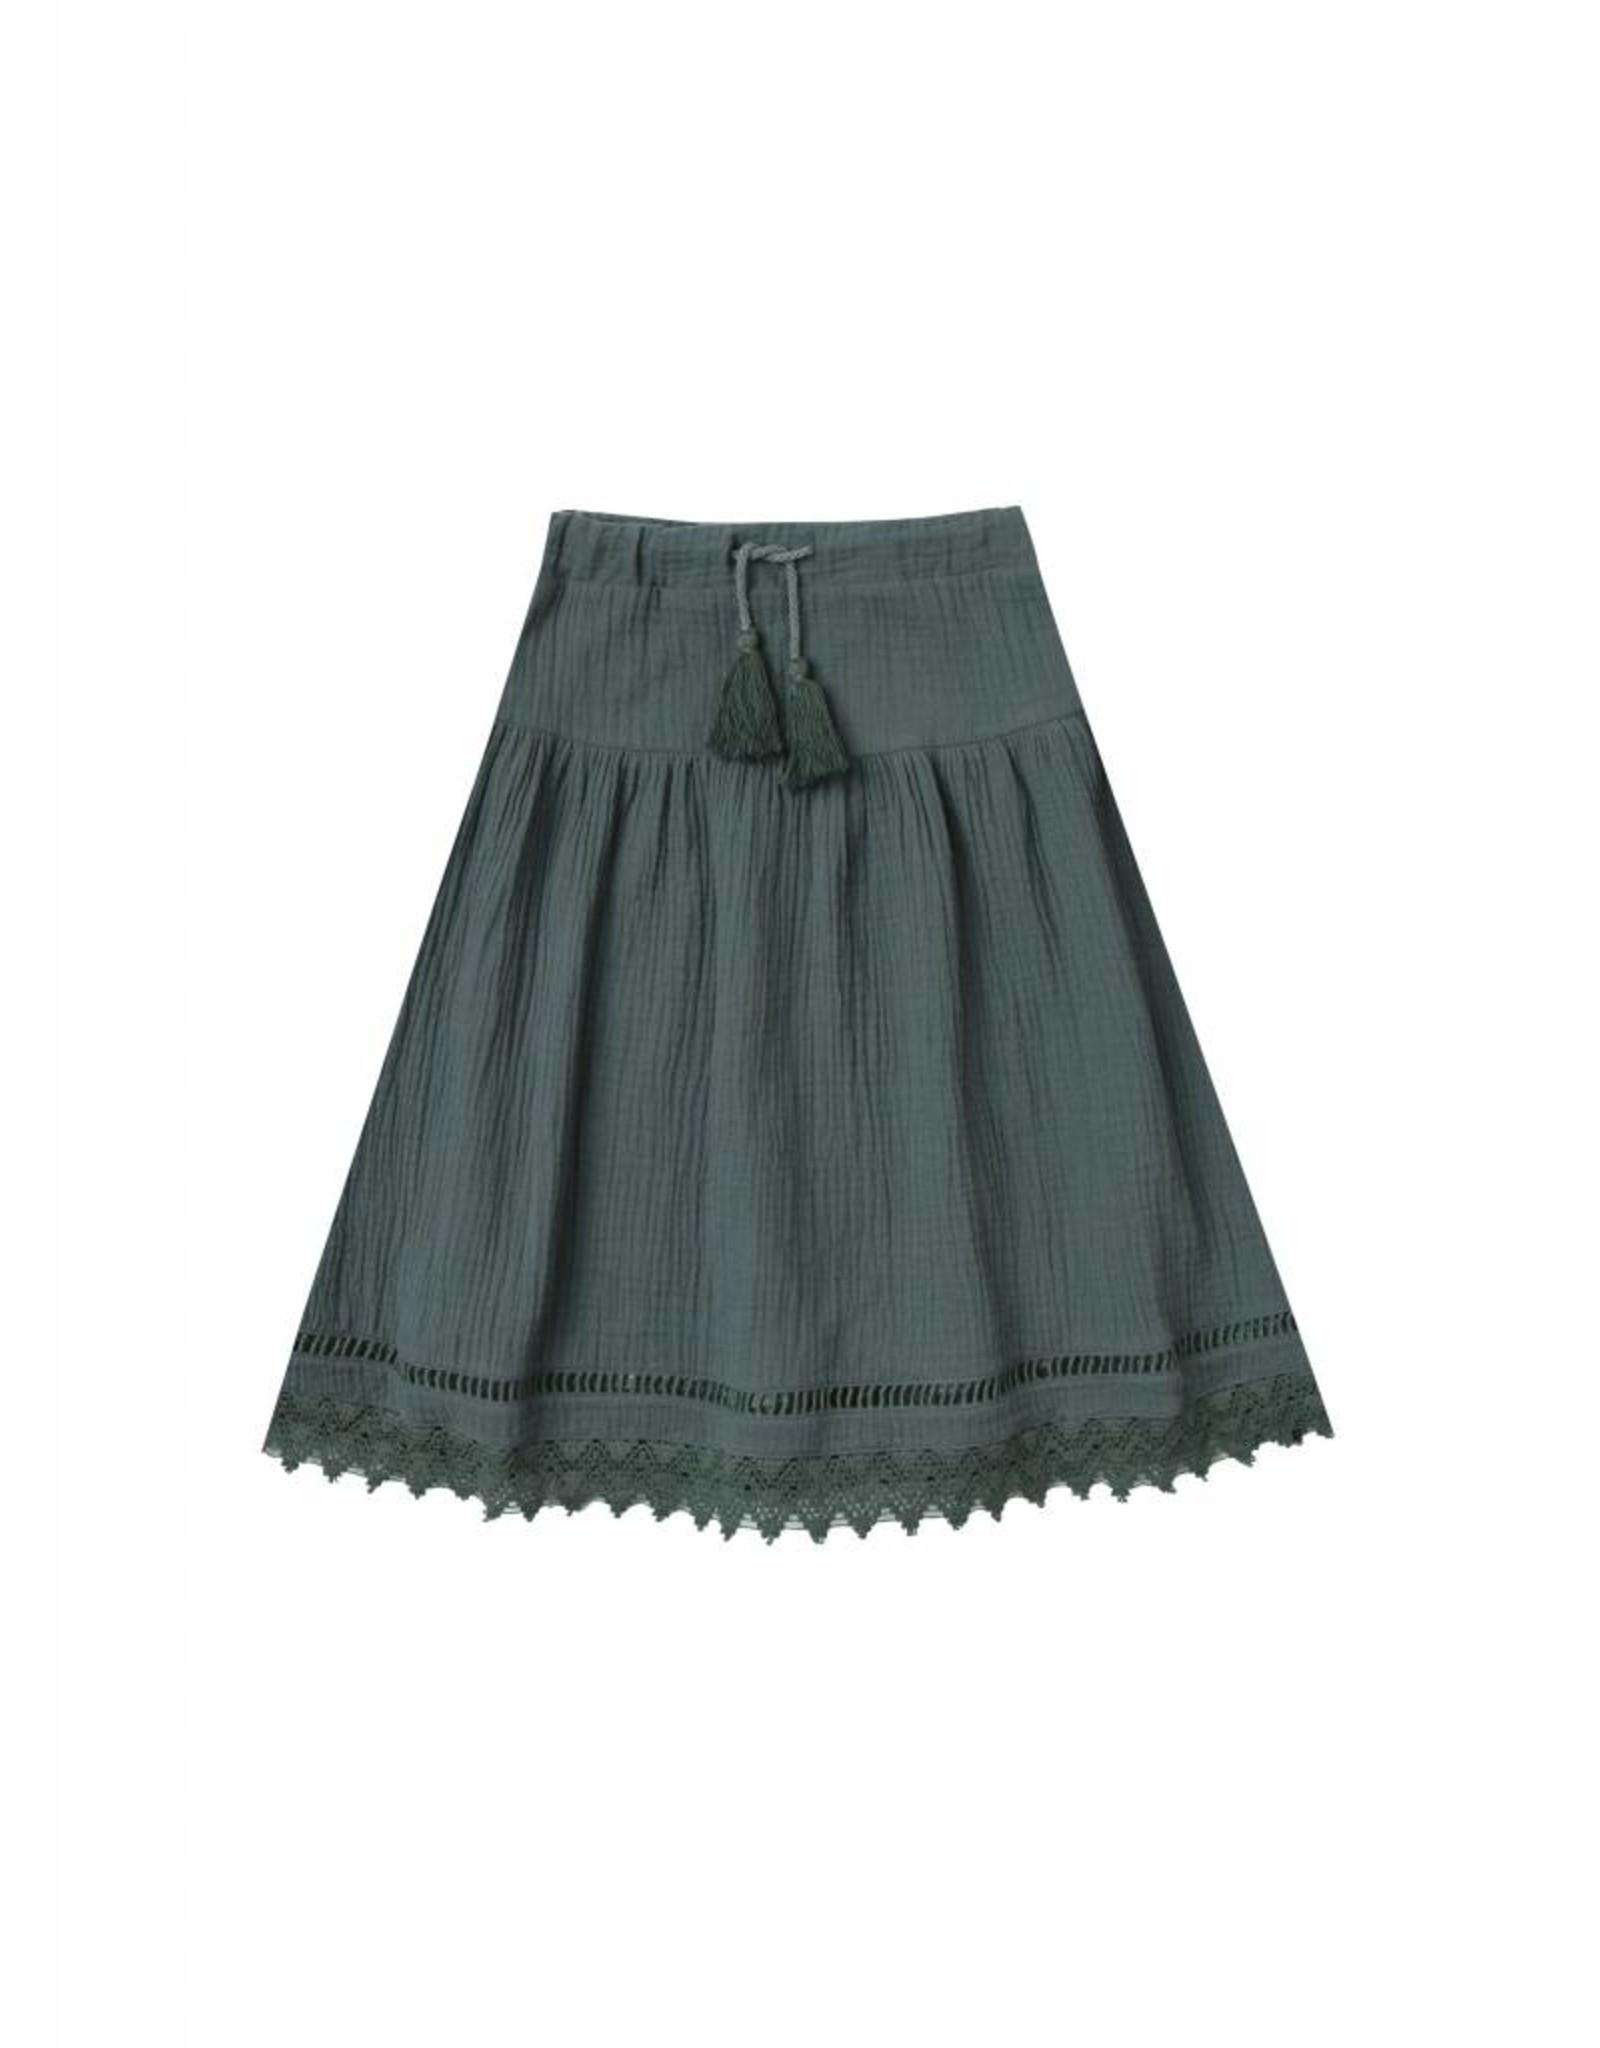 Rylee and Cru mila maxi skirt- storm